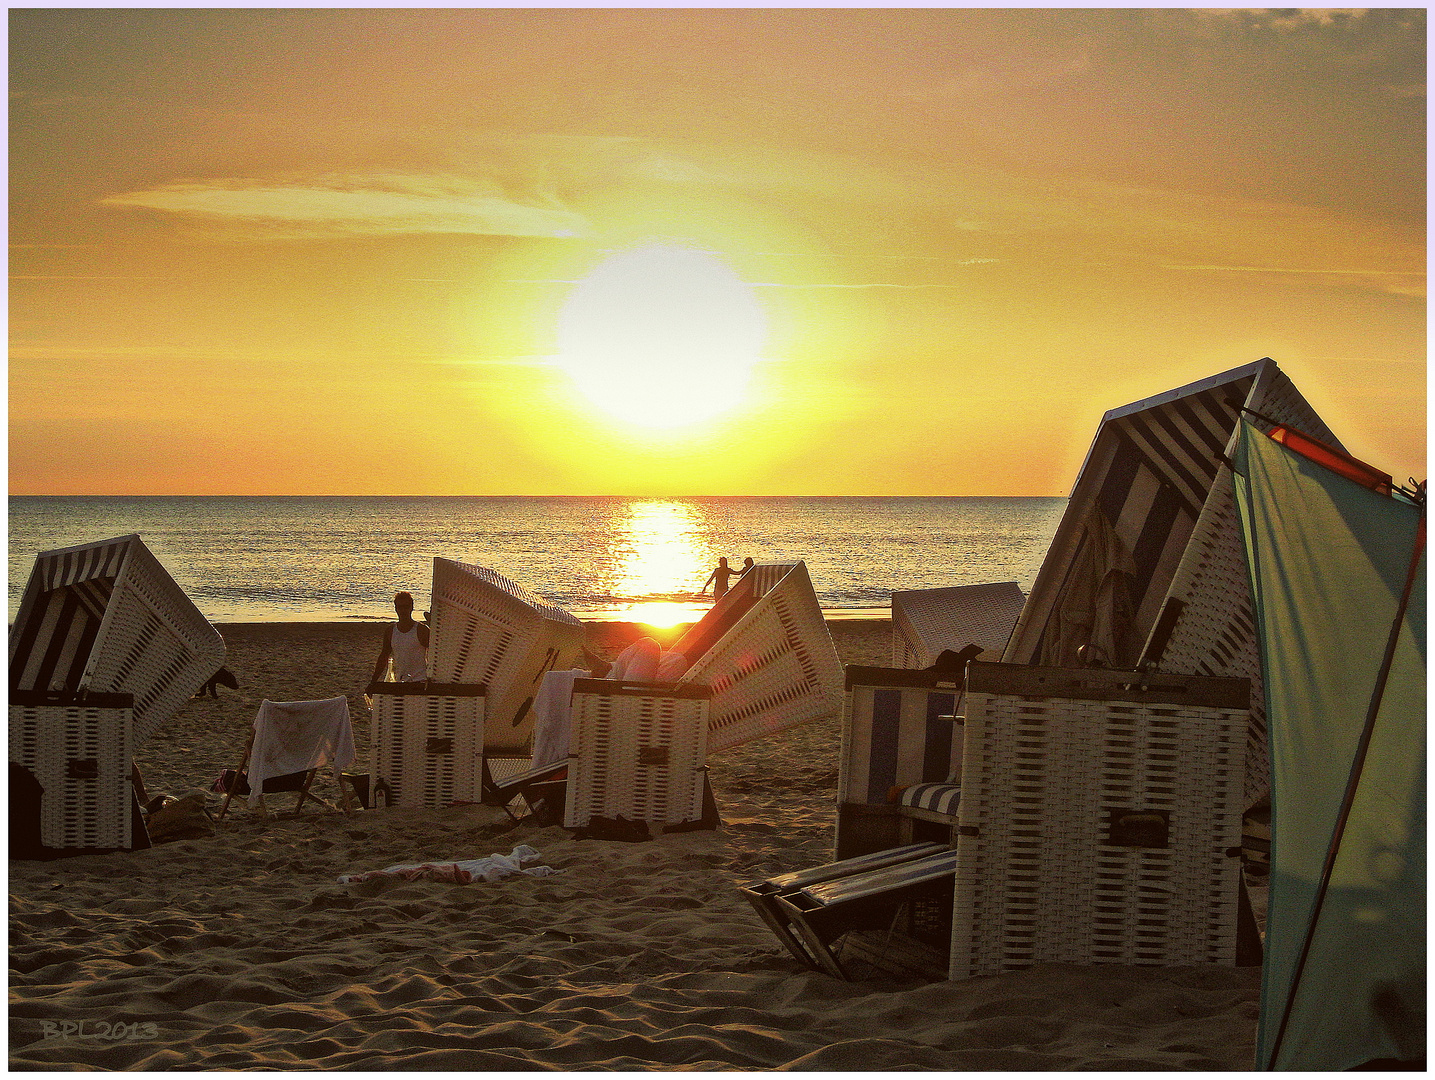 Chillen am Strand vor der berühmten Buhne16 in Kampen/Sylt